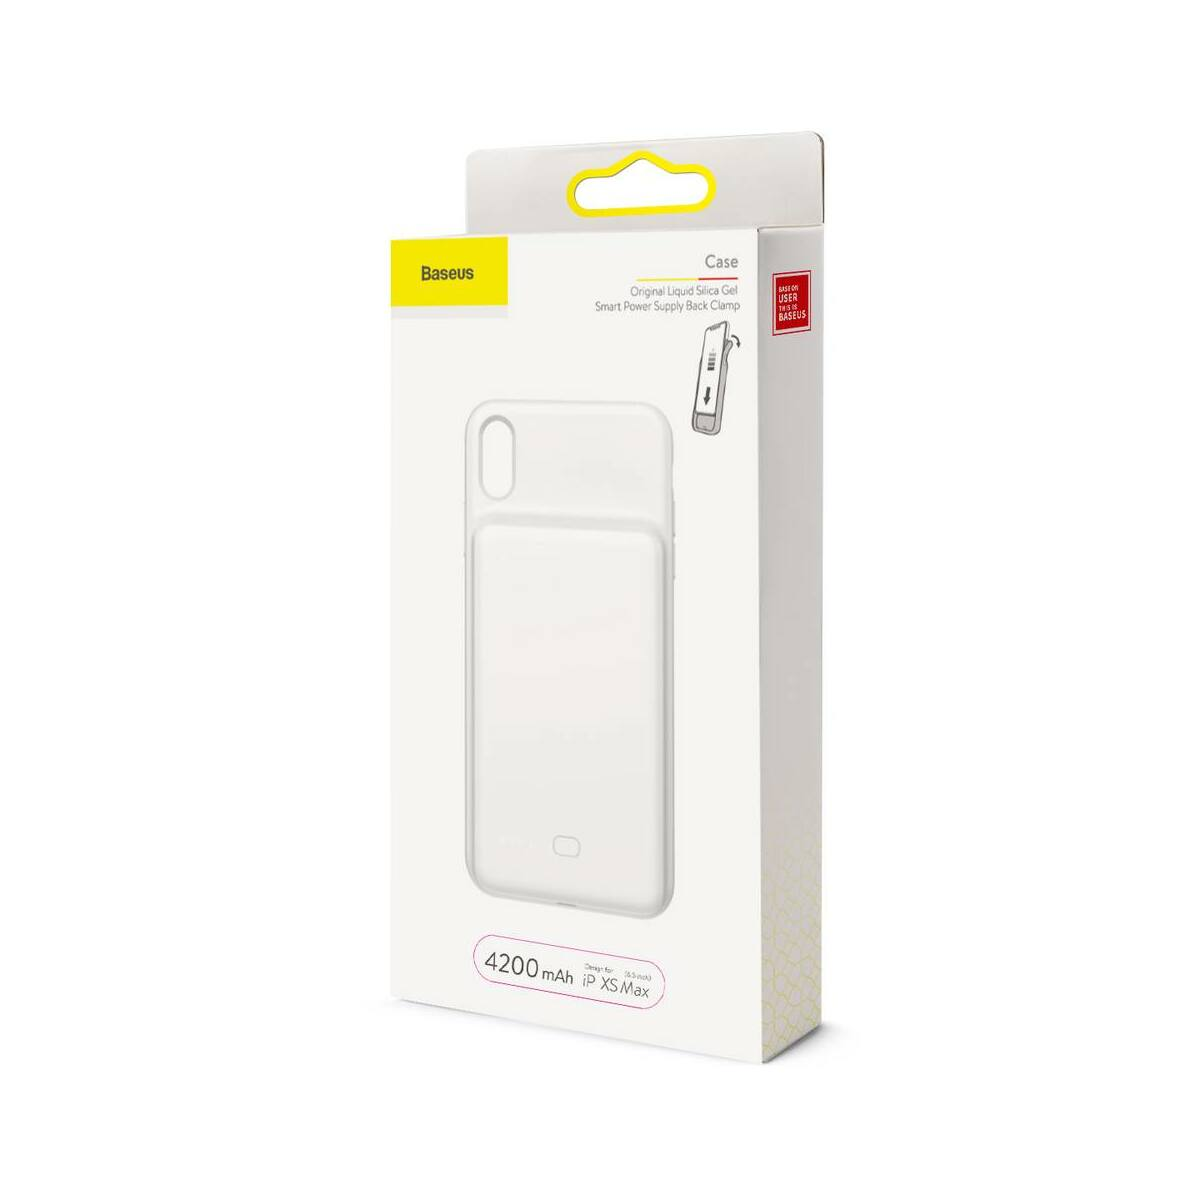 Baseus Power Bank tok, Liquid Silicone Smart back clamp 4200 mAh, XS Max, fehér (ACAPIPH65-BJ02)